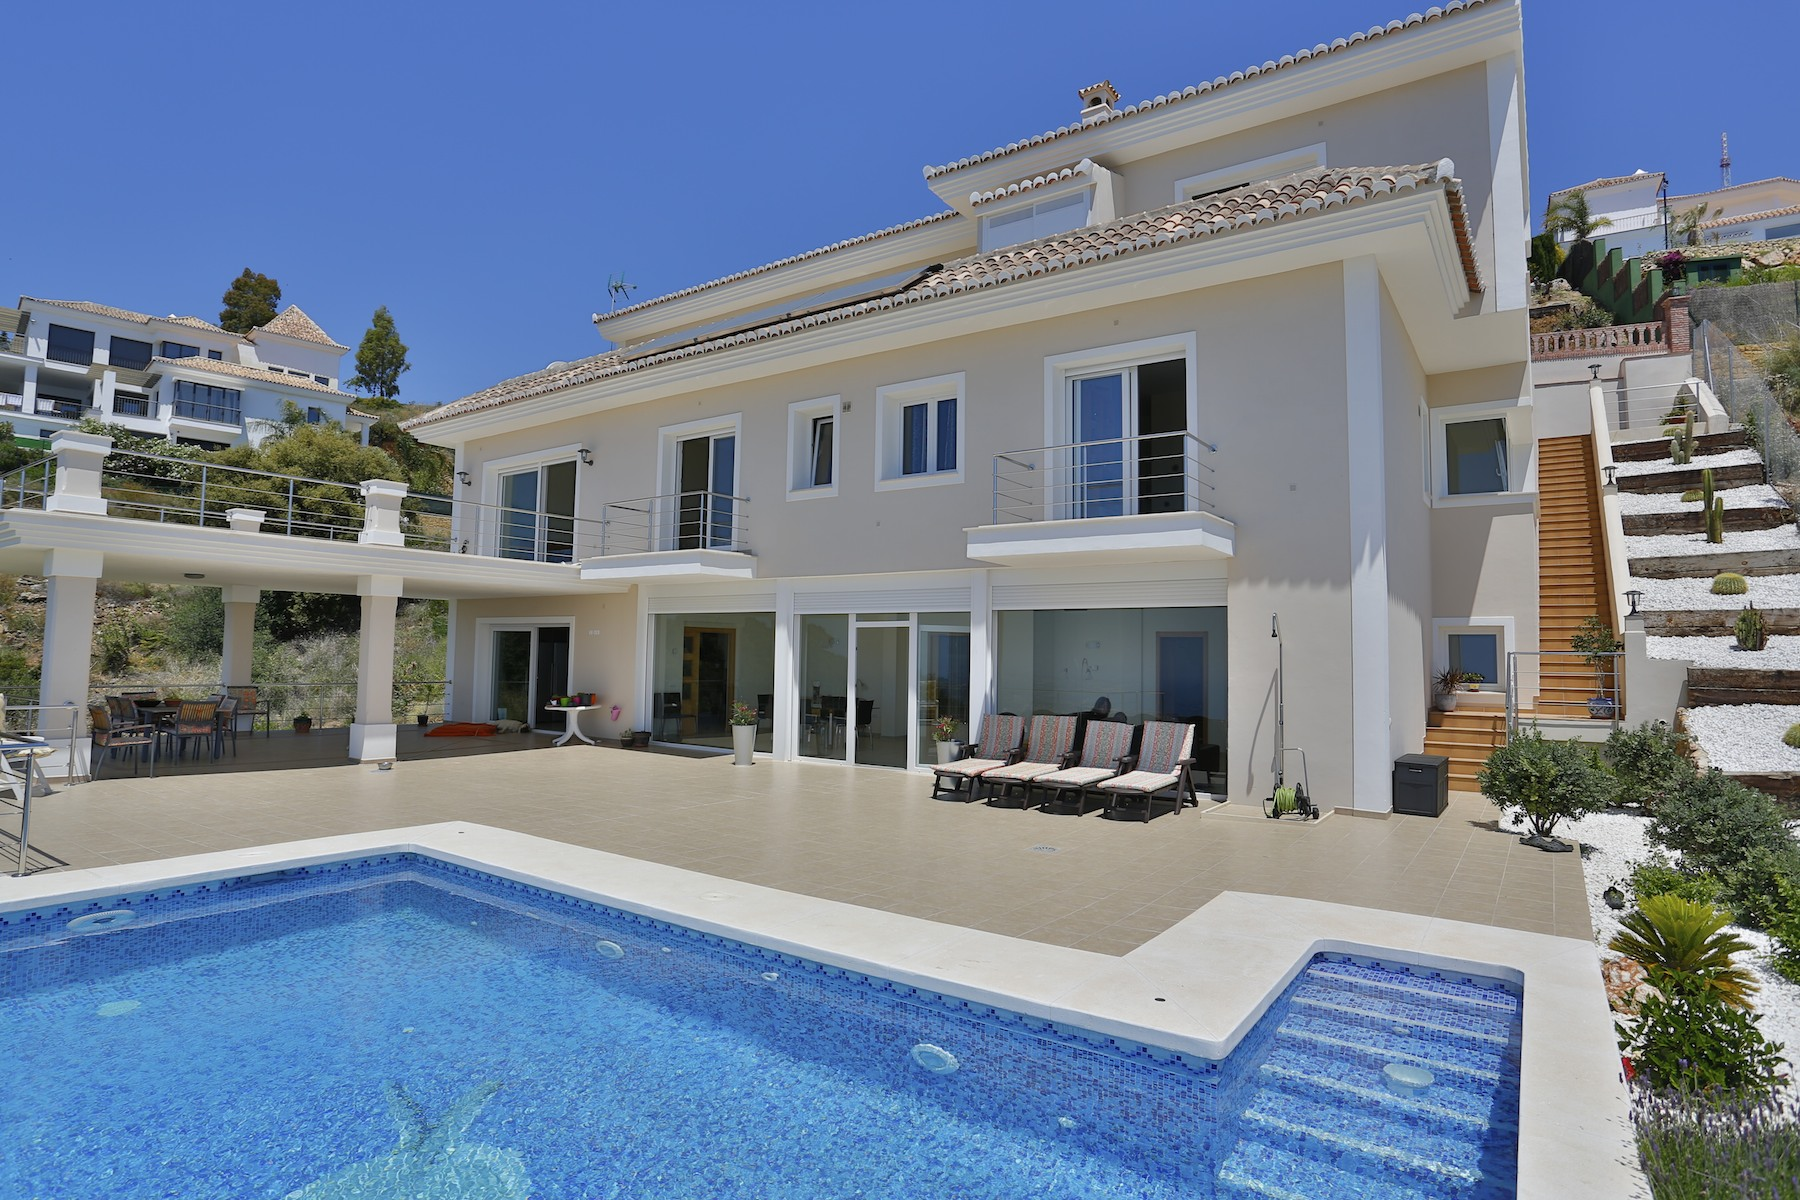 獨棟家庭住宅 為 出售 在 Modern Style villa Altos de Los Monteros Marbella, Costa Del Sol, 29600 西班牙